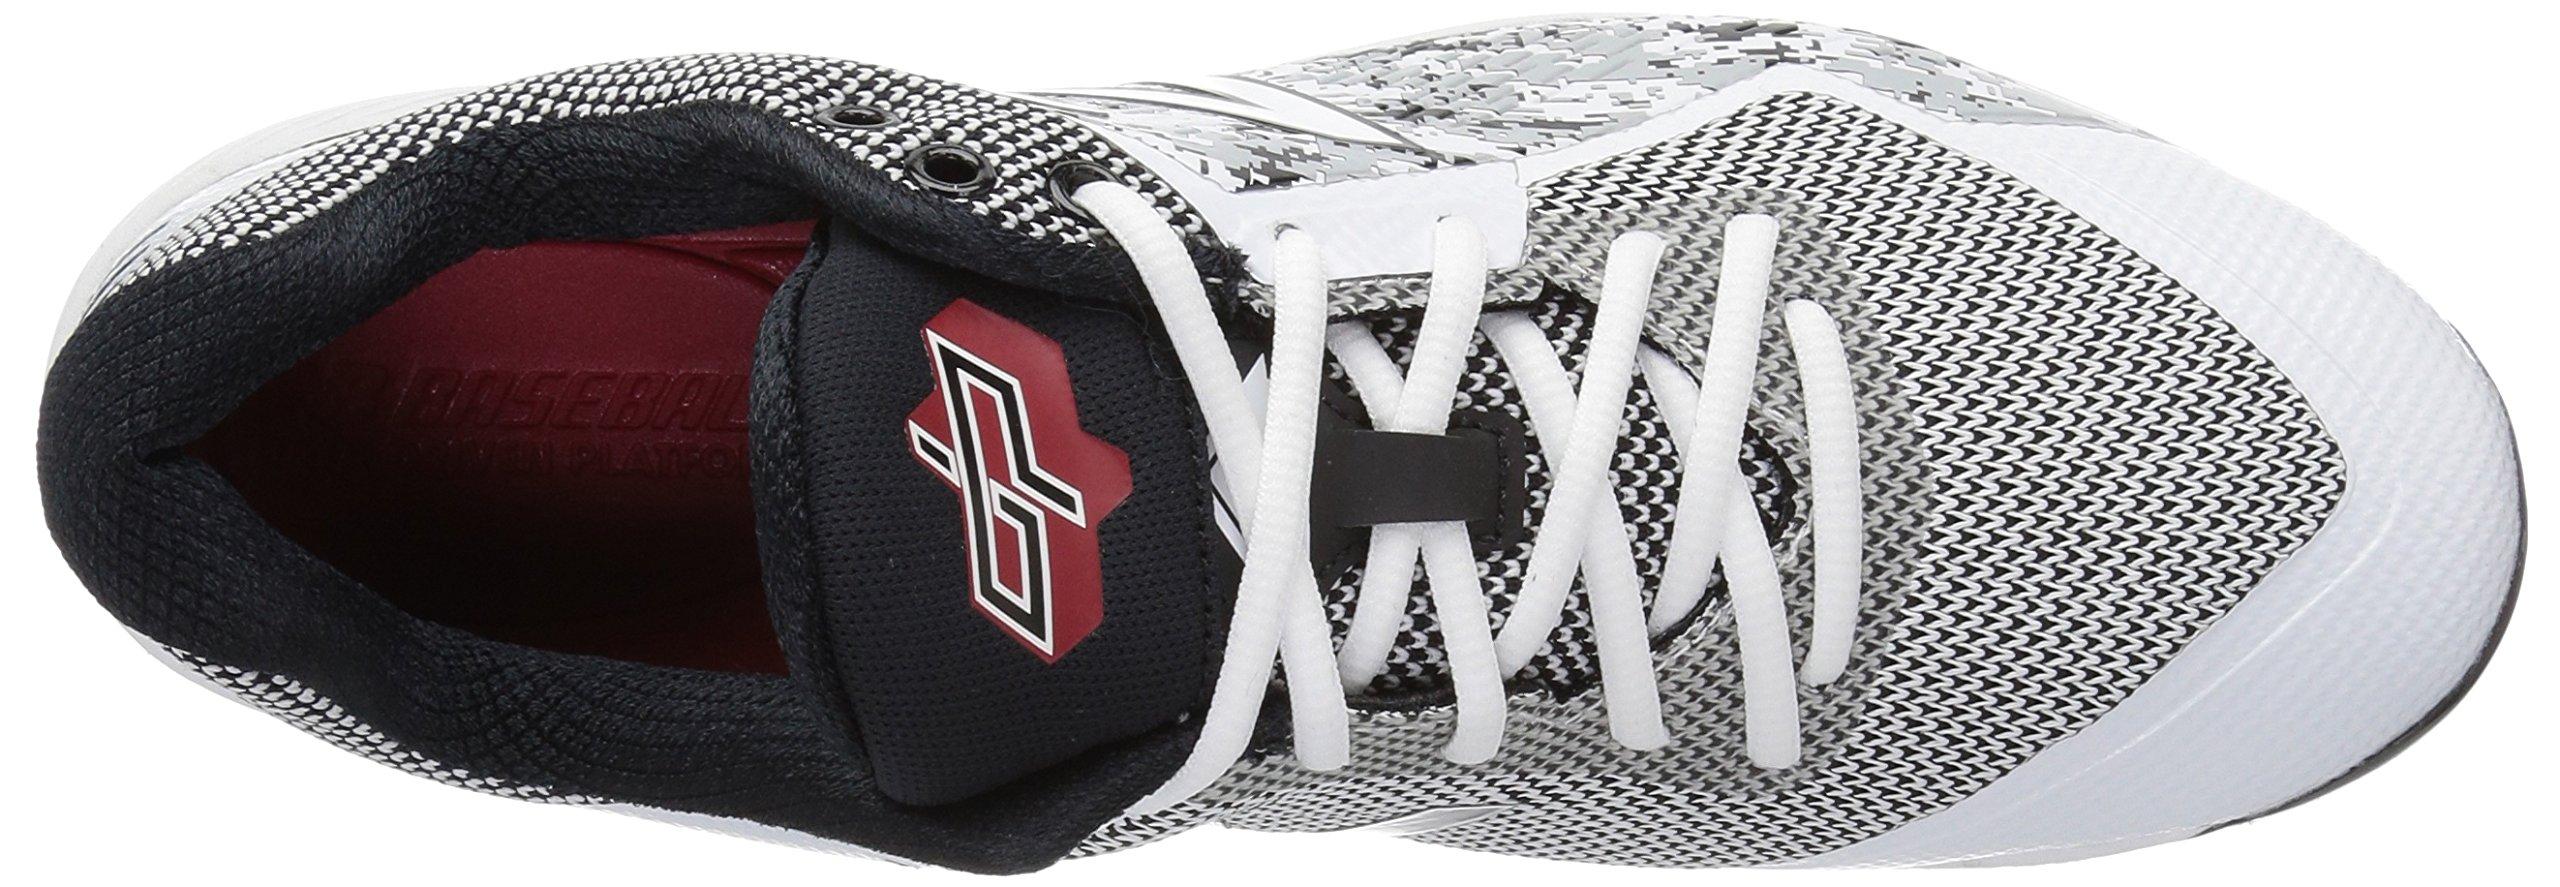 New Balance Men's L4040v4 Metal Baseball Shoe, Silver/Camo, 7.5 2E US by New Balance (Image #8)